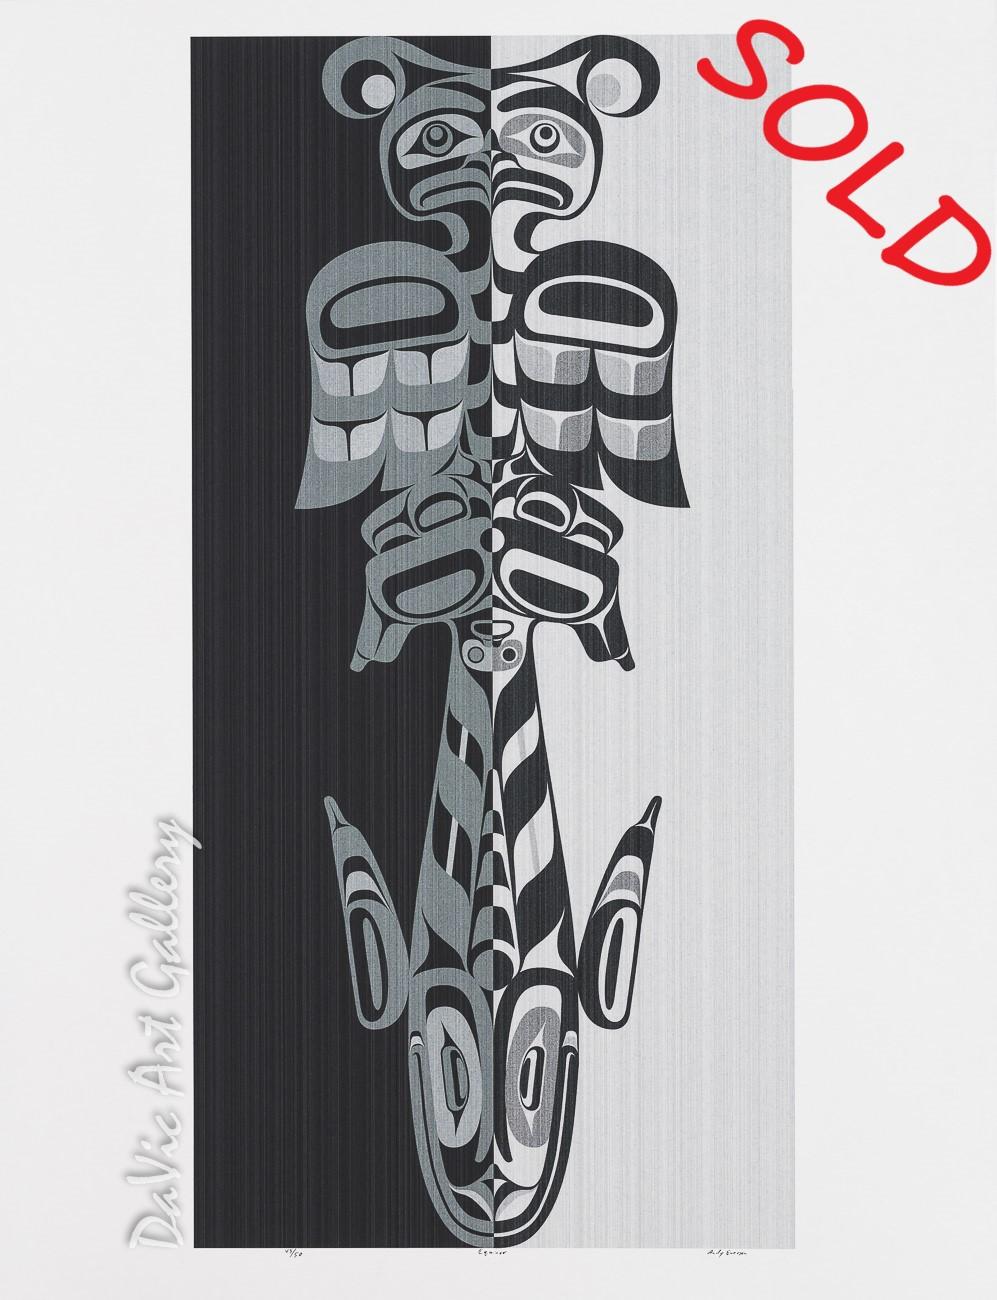 Equinox by Andy Everson 2005 - Northwest Coast - Kwakwaka'wakw